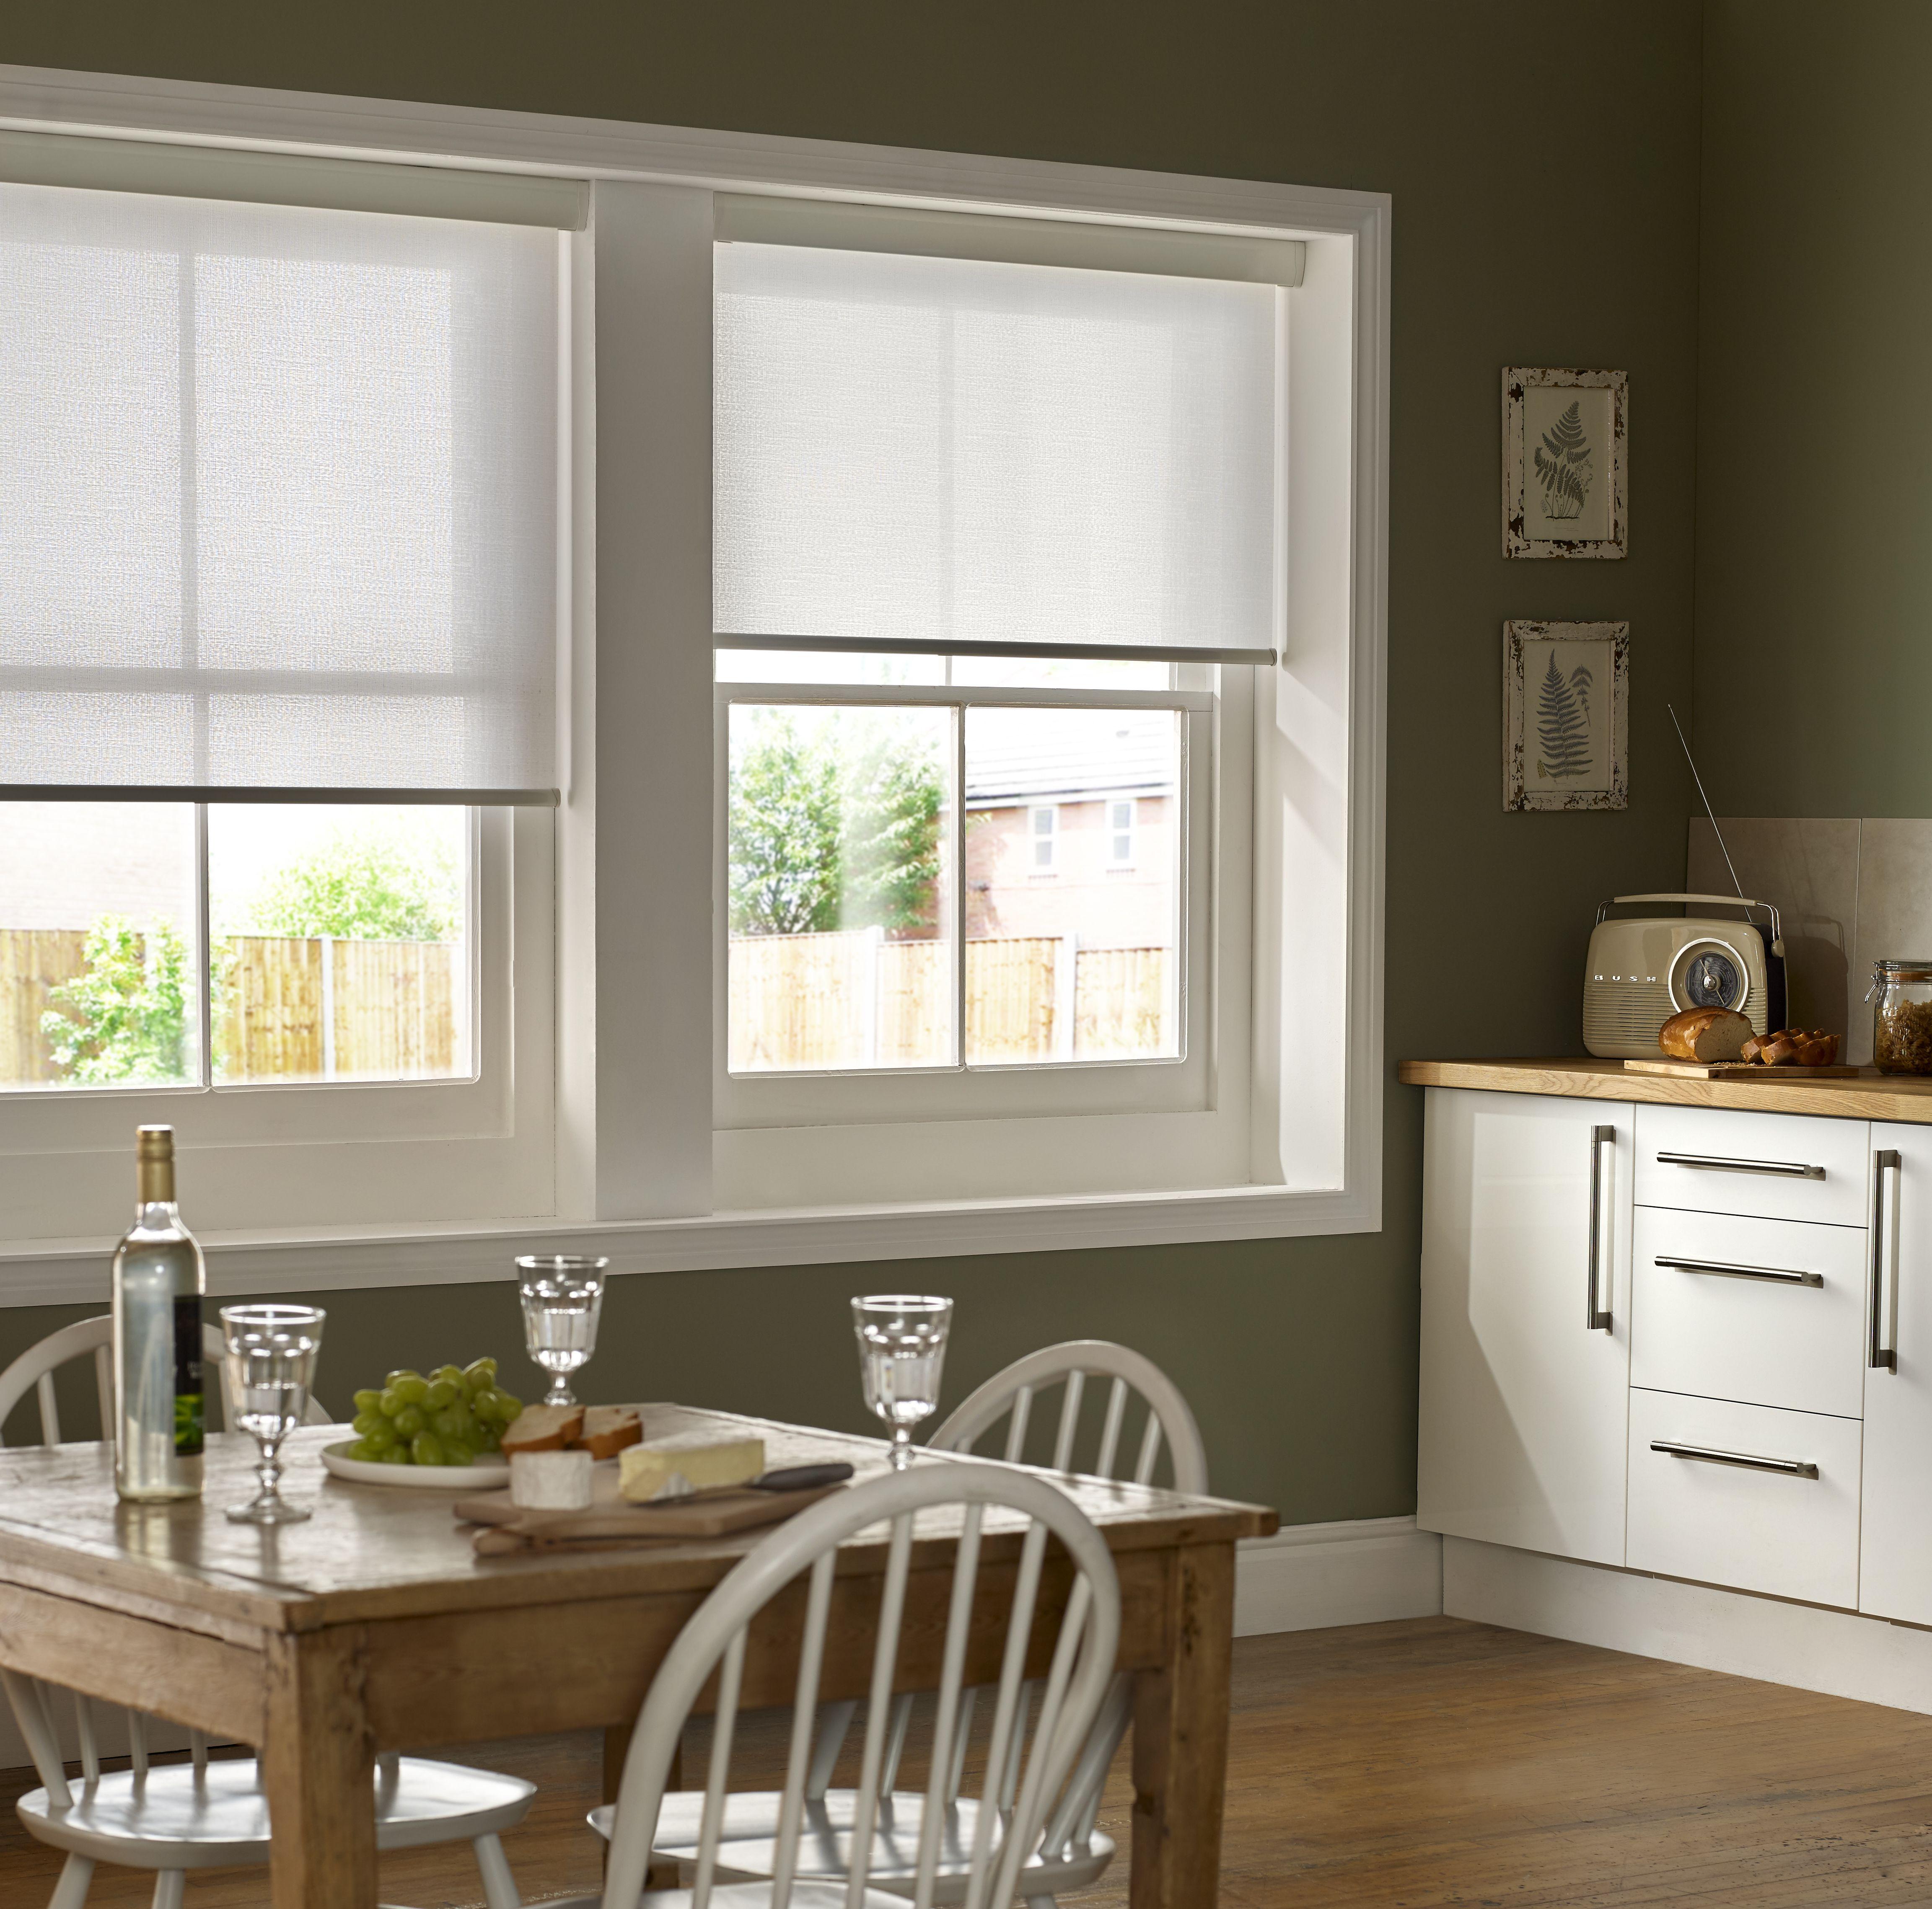 White Kitchen Dark Floors Colorful Window Treatment: BLING BLING FOR YOUR WINDOWS! ~CUSTOM ROLLER SHADES